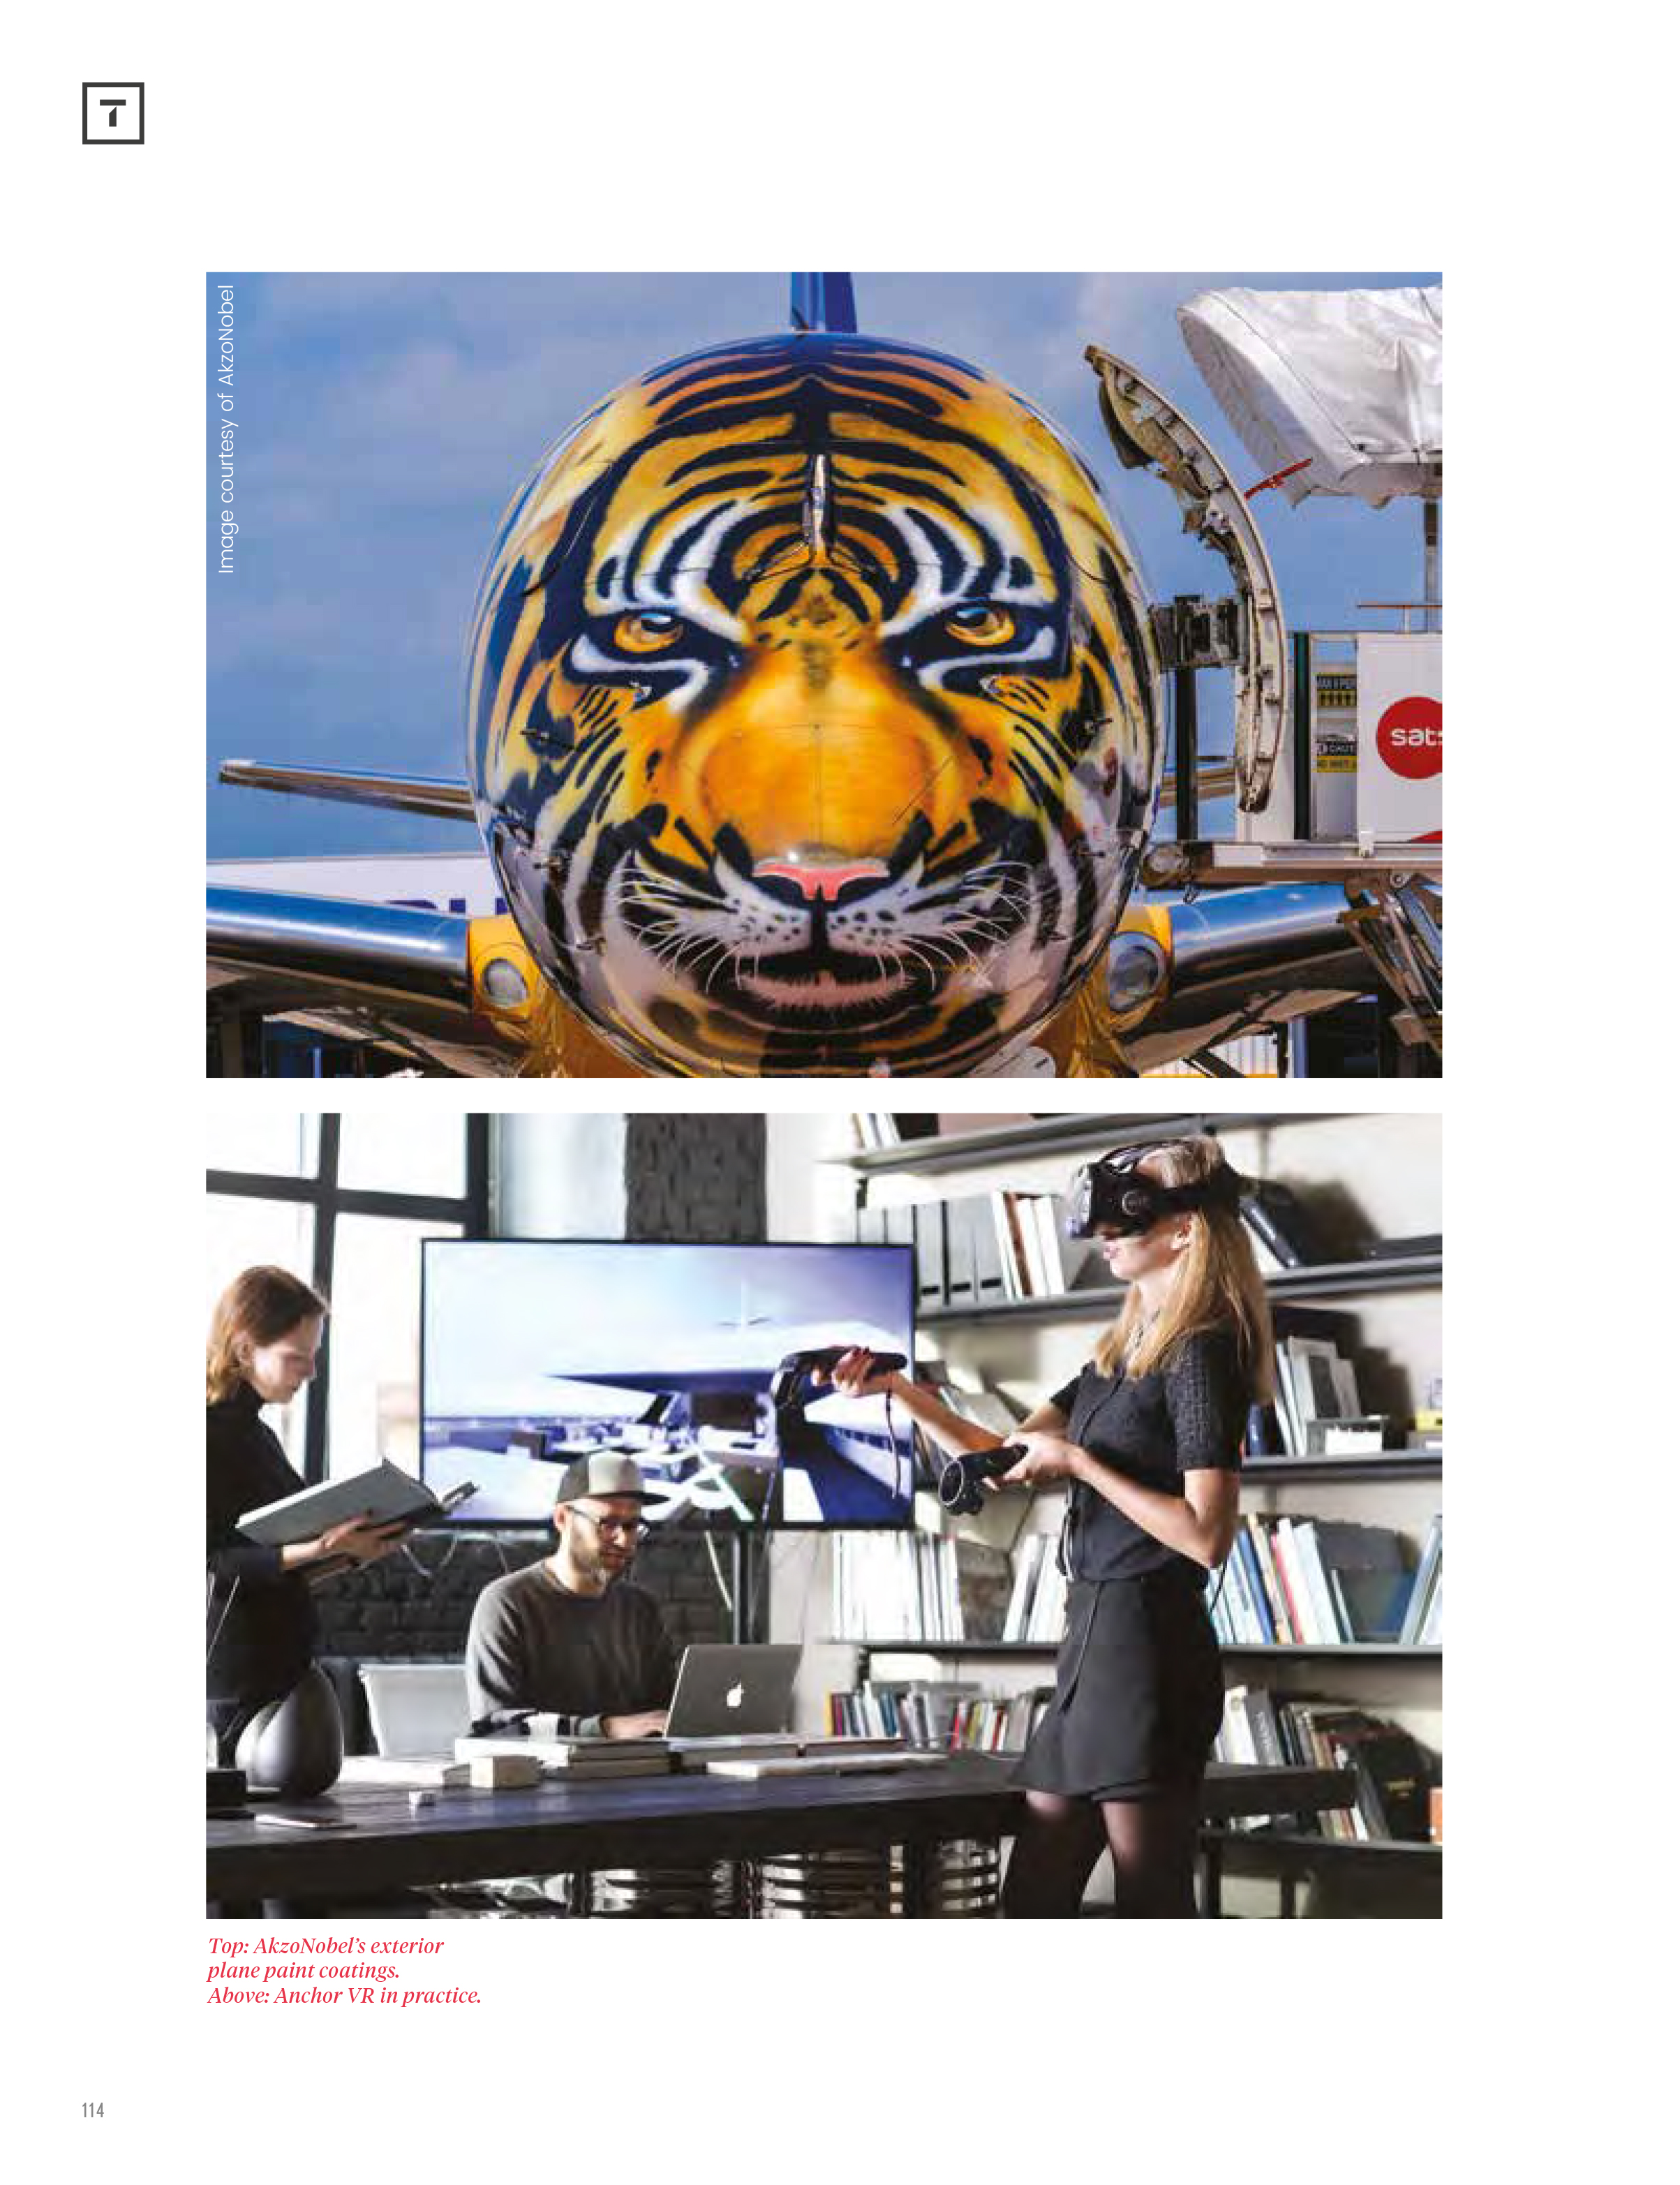 The Superyacht Business Report-001-114.jpg